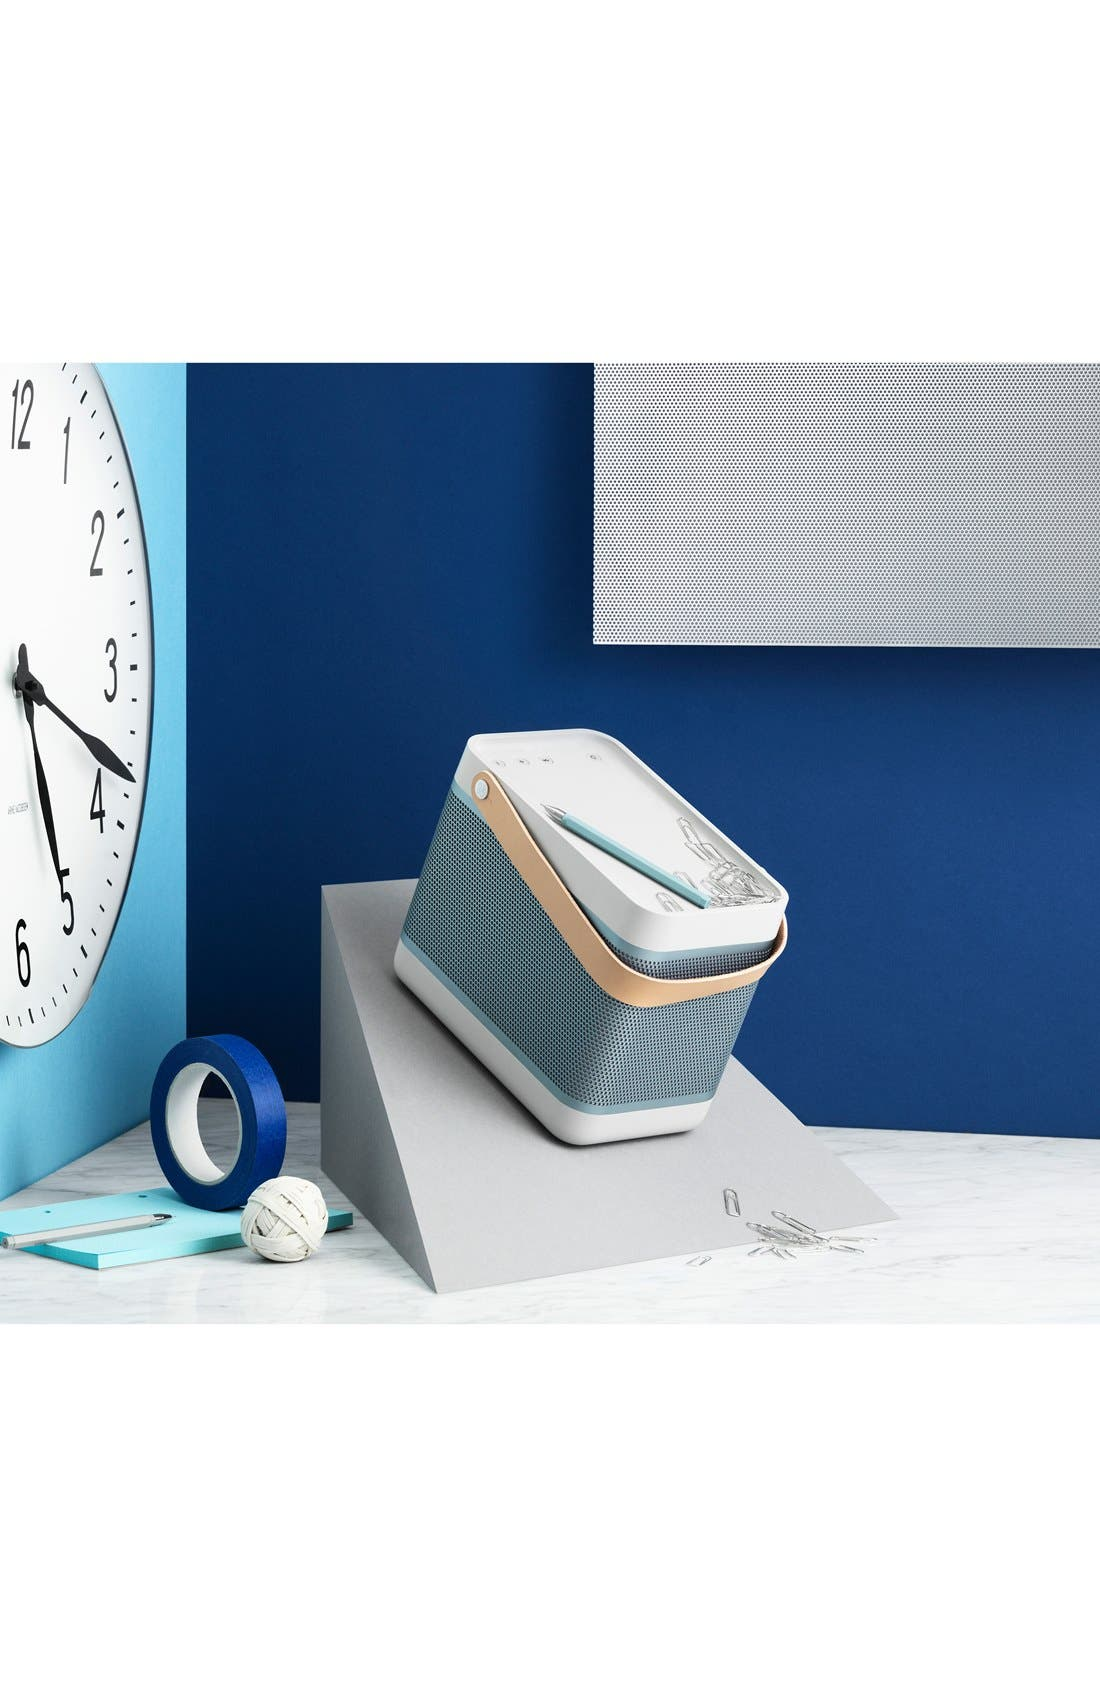 'Beolit 15' Portable Bluetooth<sup>®</sup> Speaker,                             Alternate thumbnail 4, color,                             POLAR BLUE